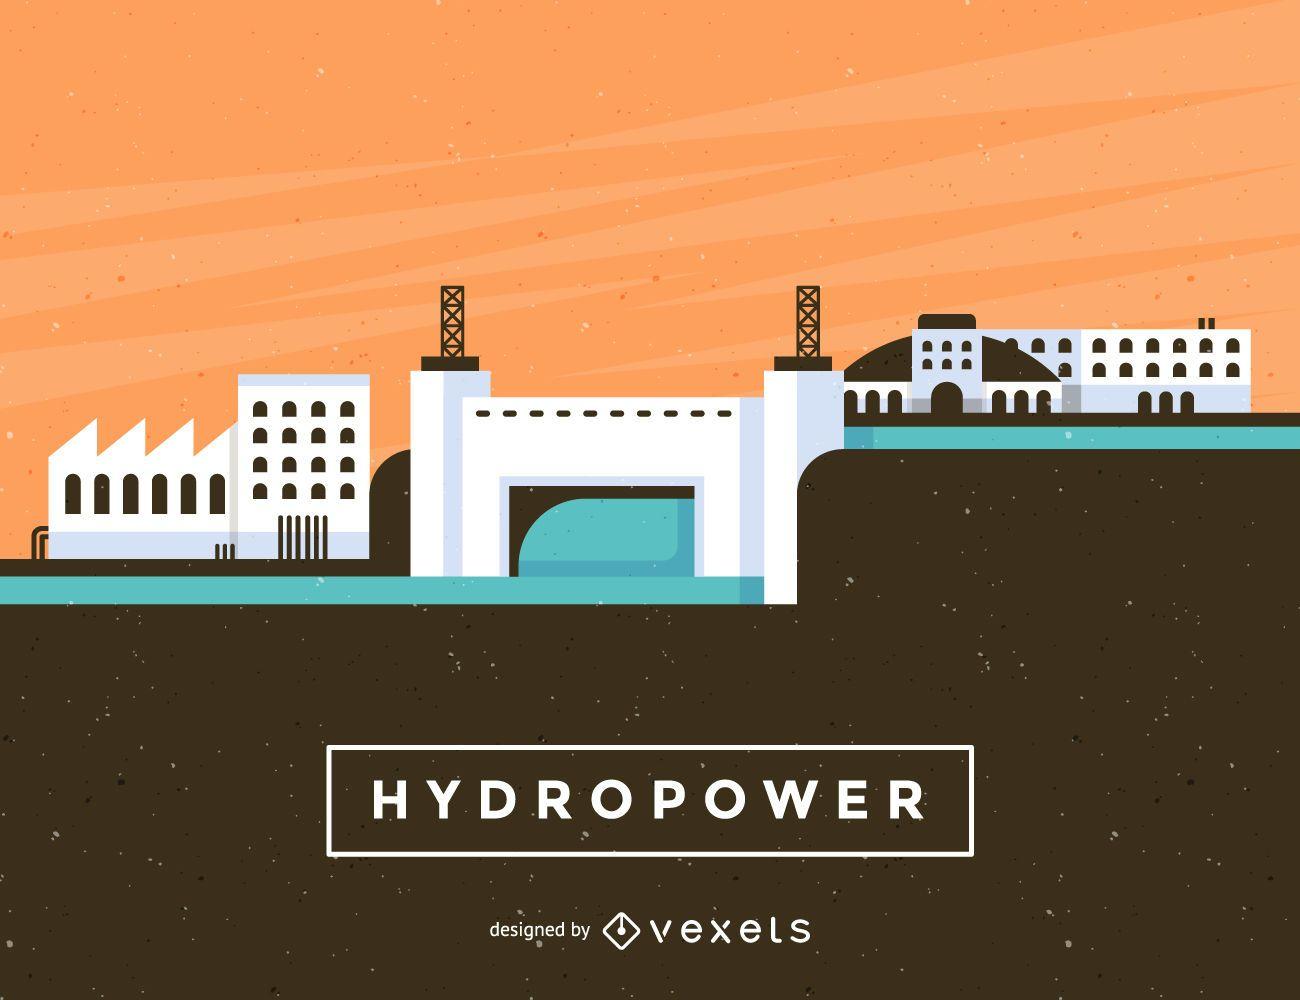 Hydropower plant illustration